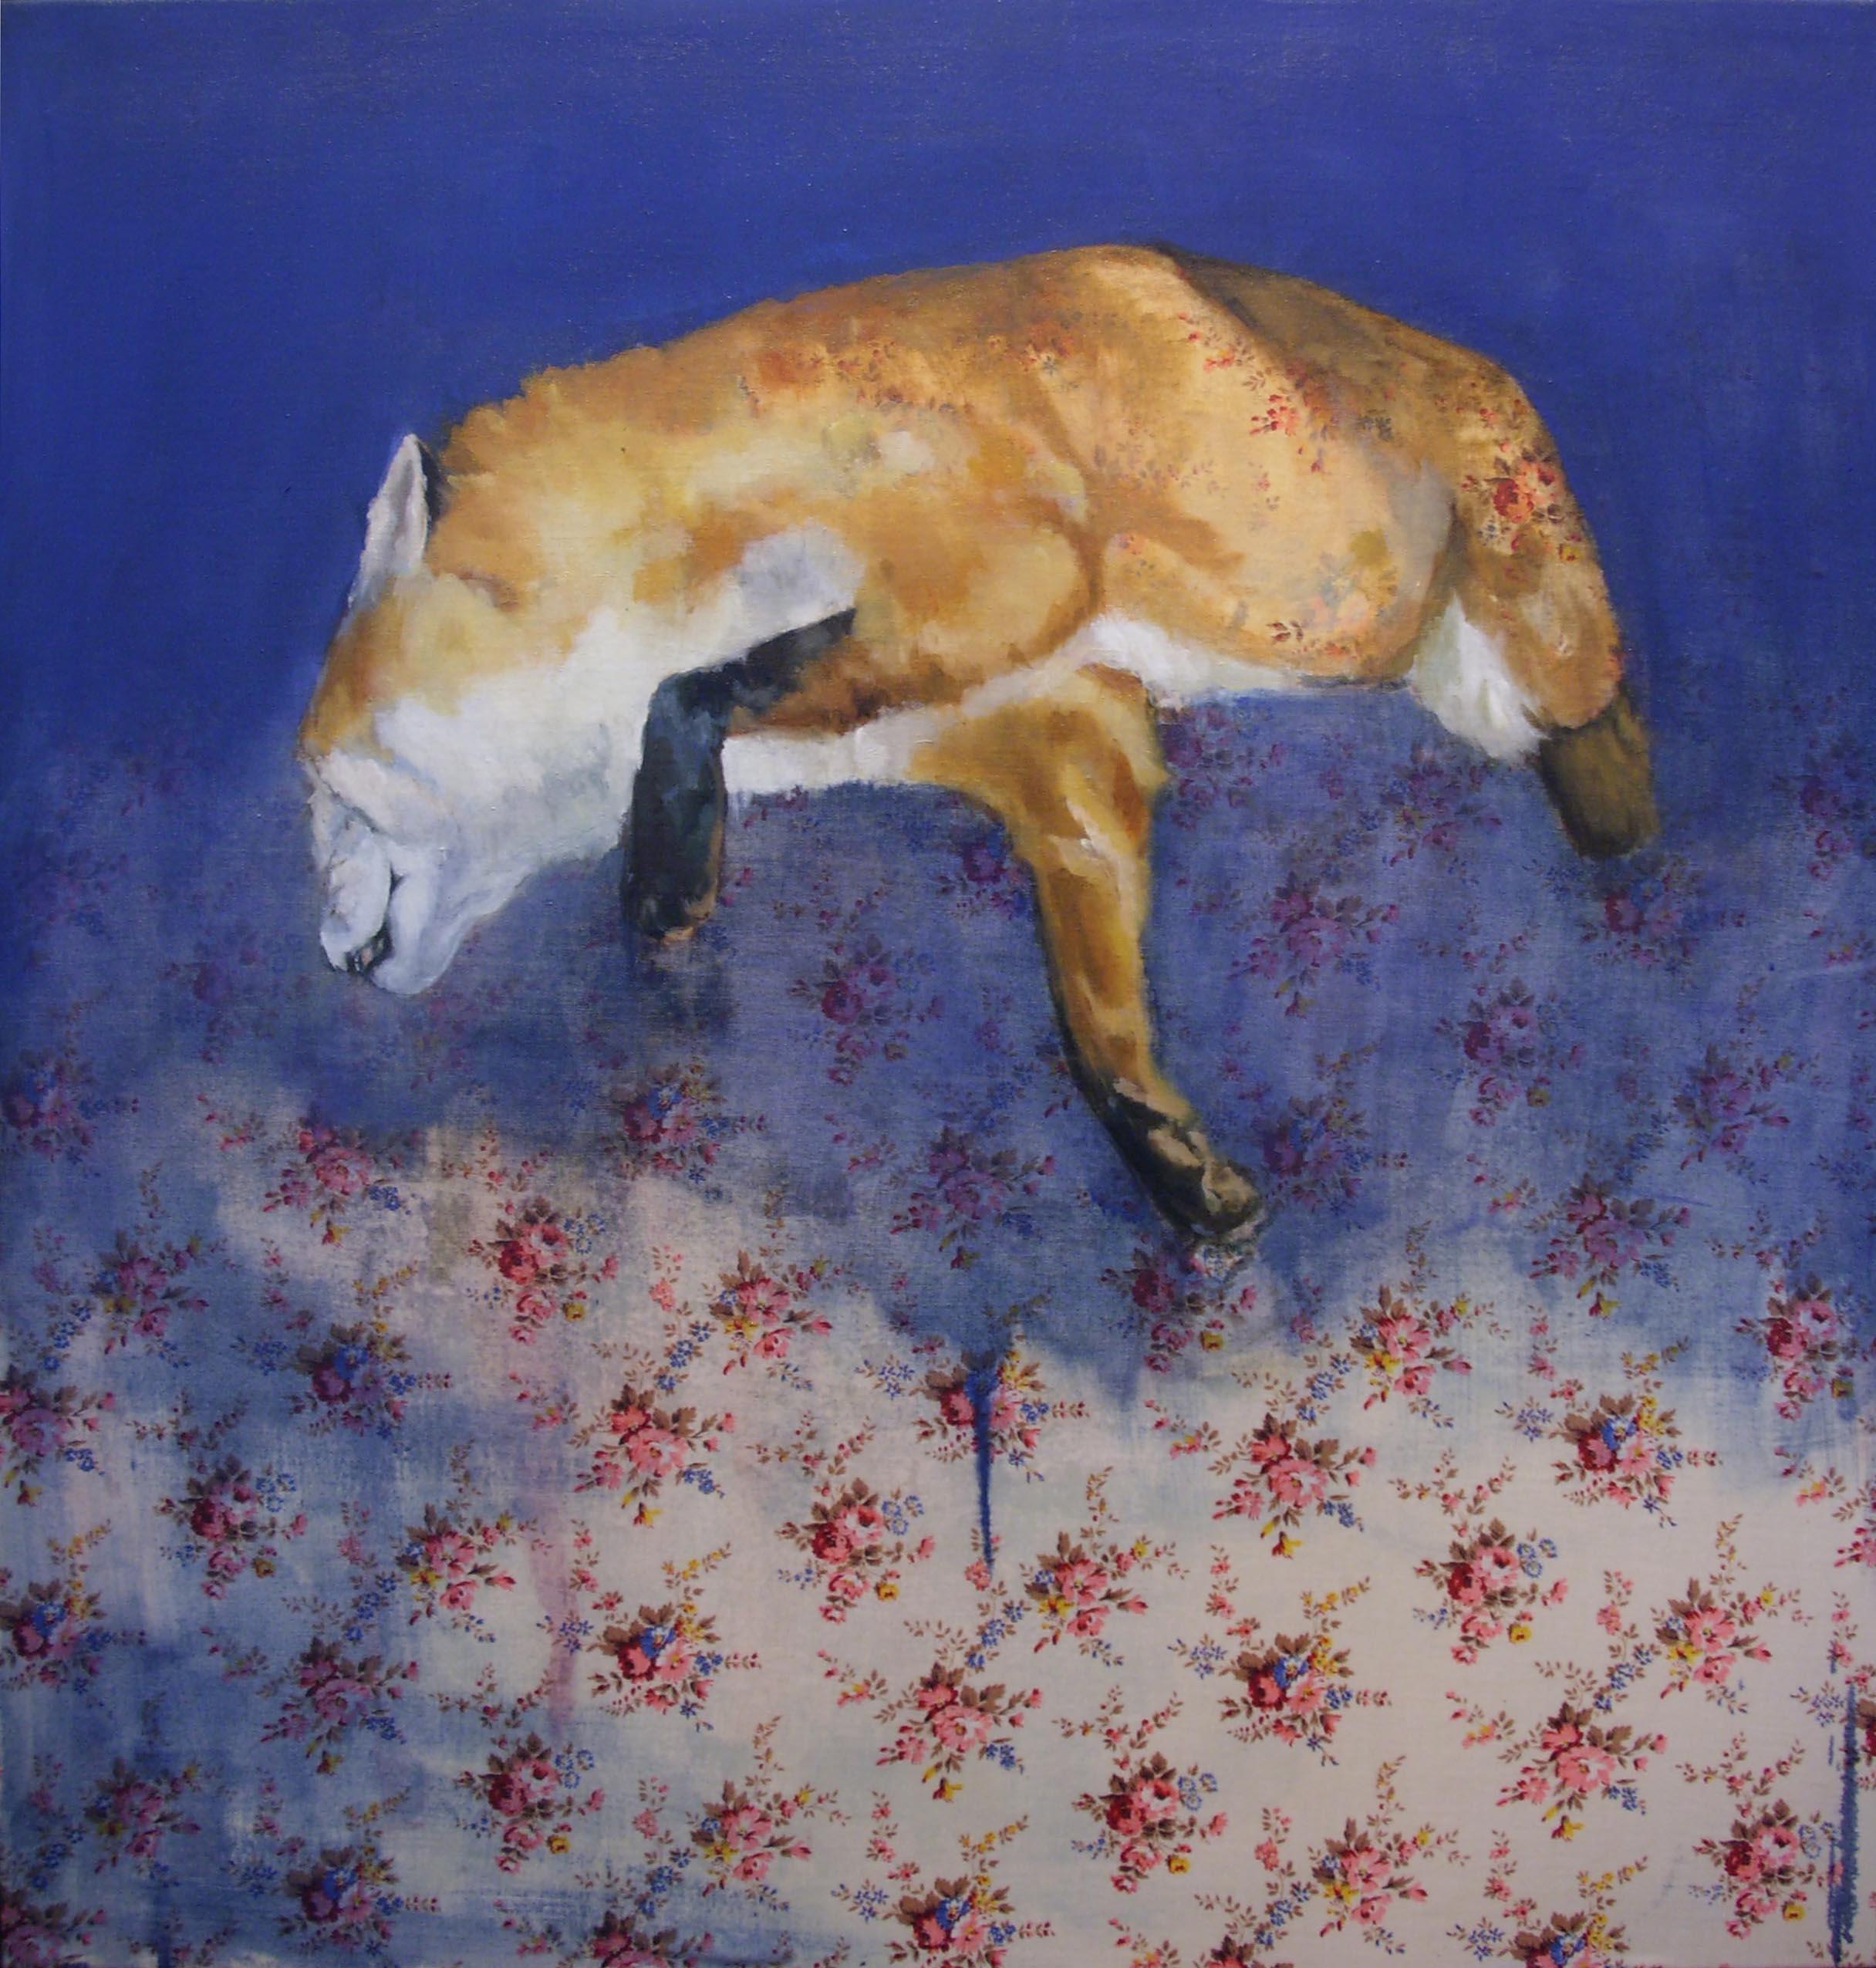 Un renard mort